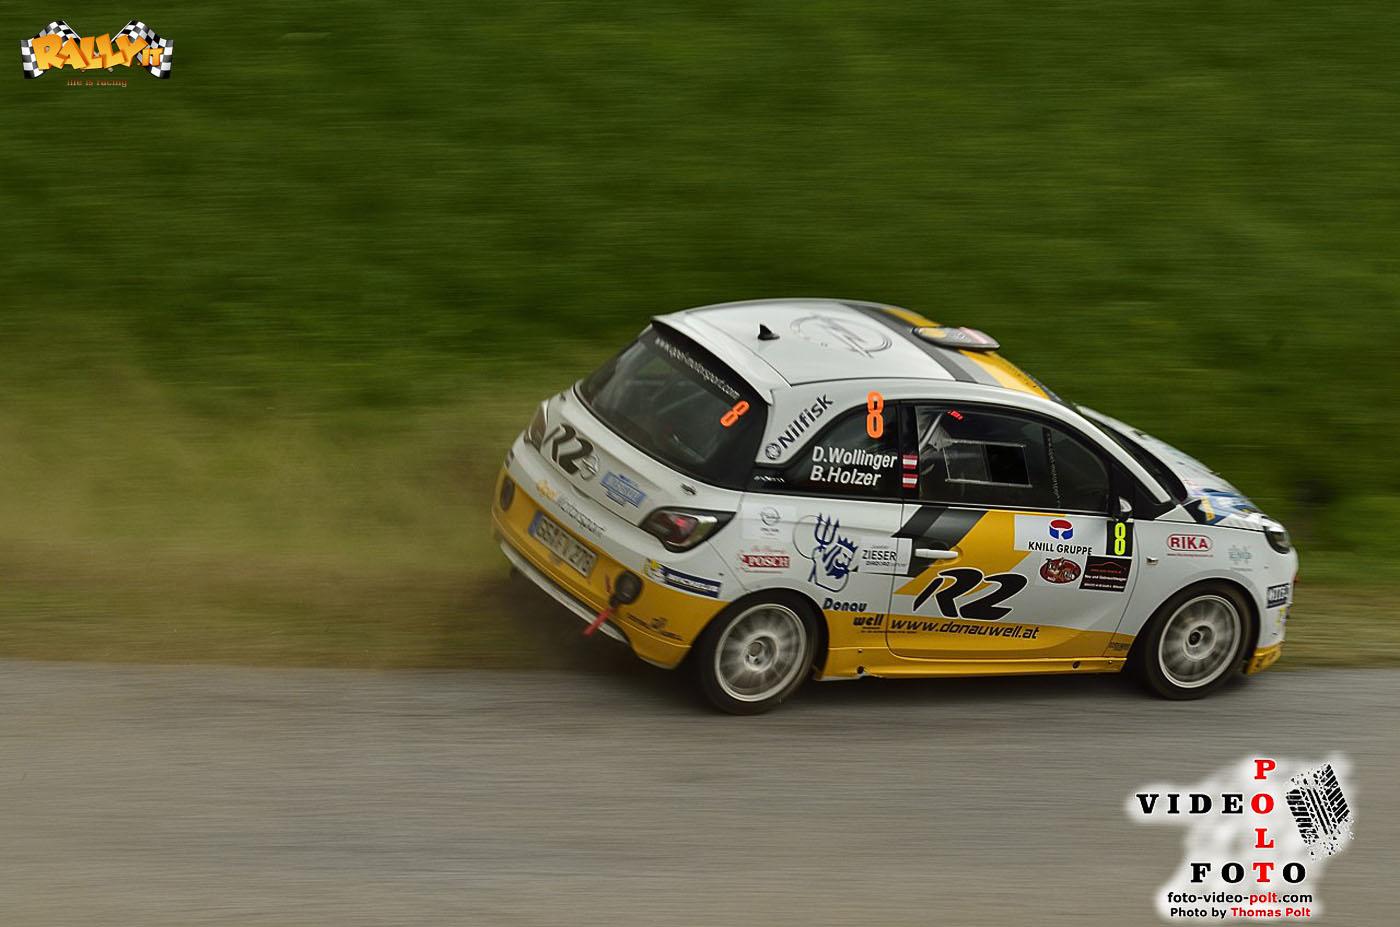 008-ORM Rallye Weiz-2014-Thomas Polt-Rally-it.jpg